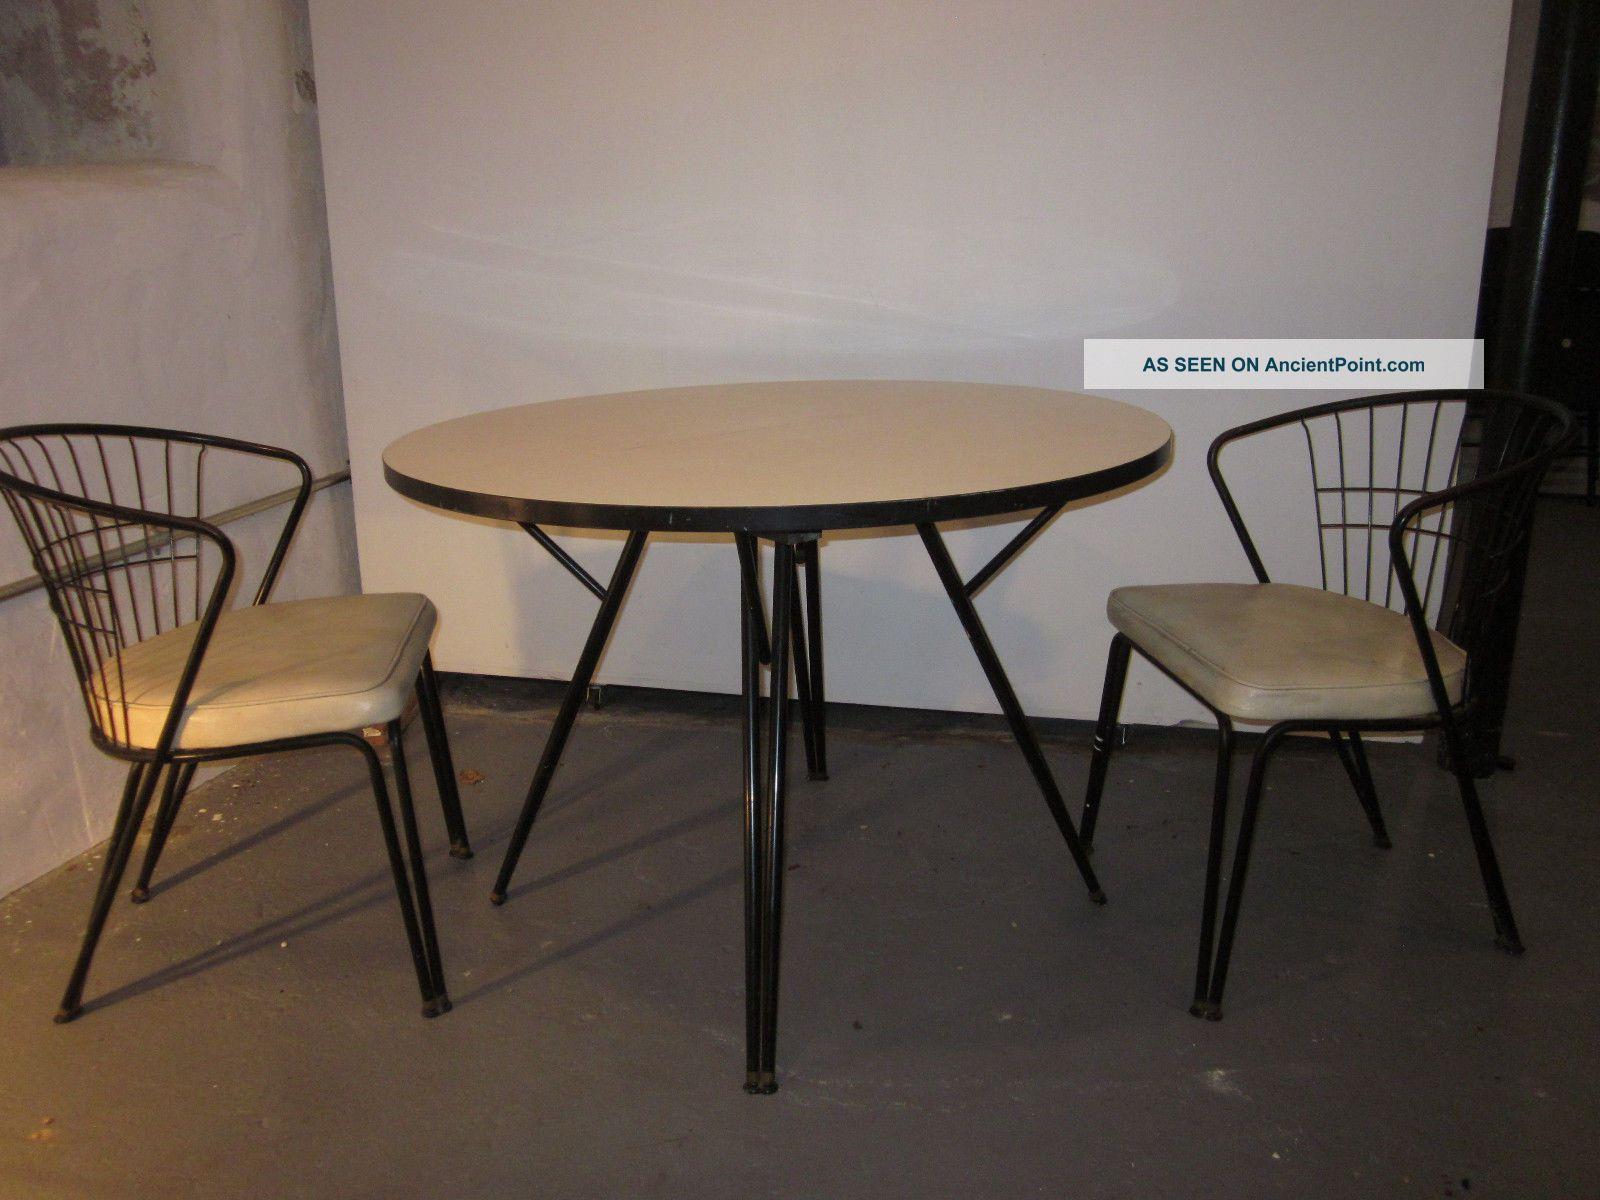 Herman Miller Vintage 1950 ' S Table Eiffel Chairs White Mid Century Mod Post-1950 photo